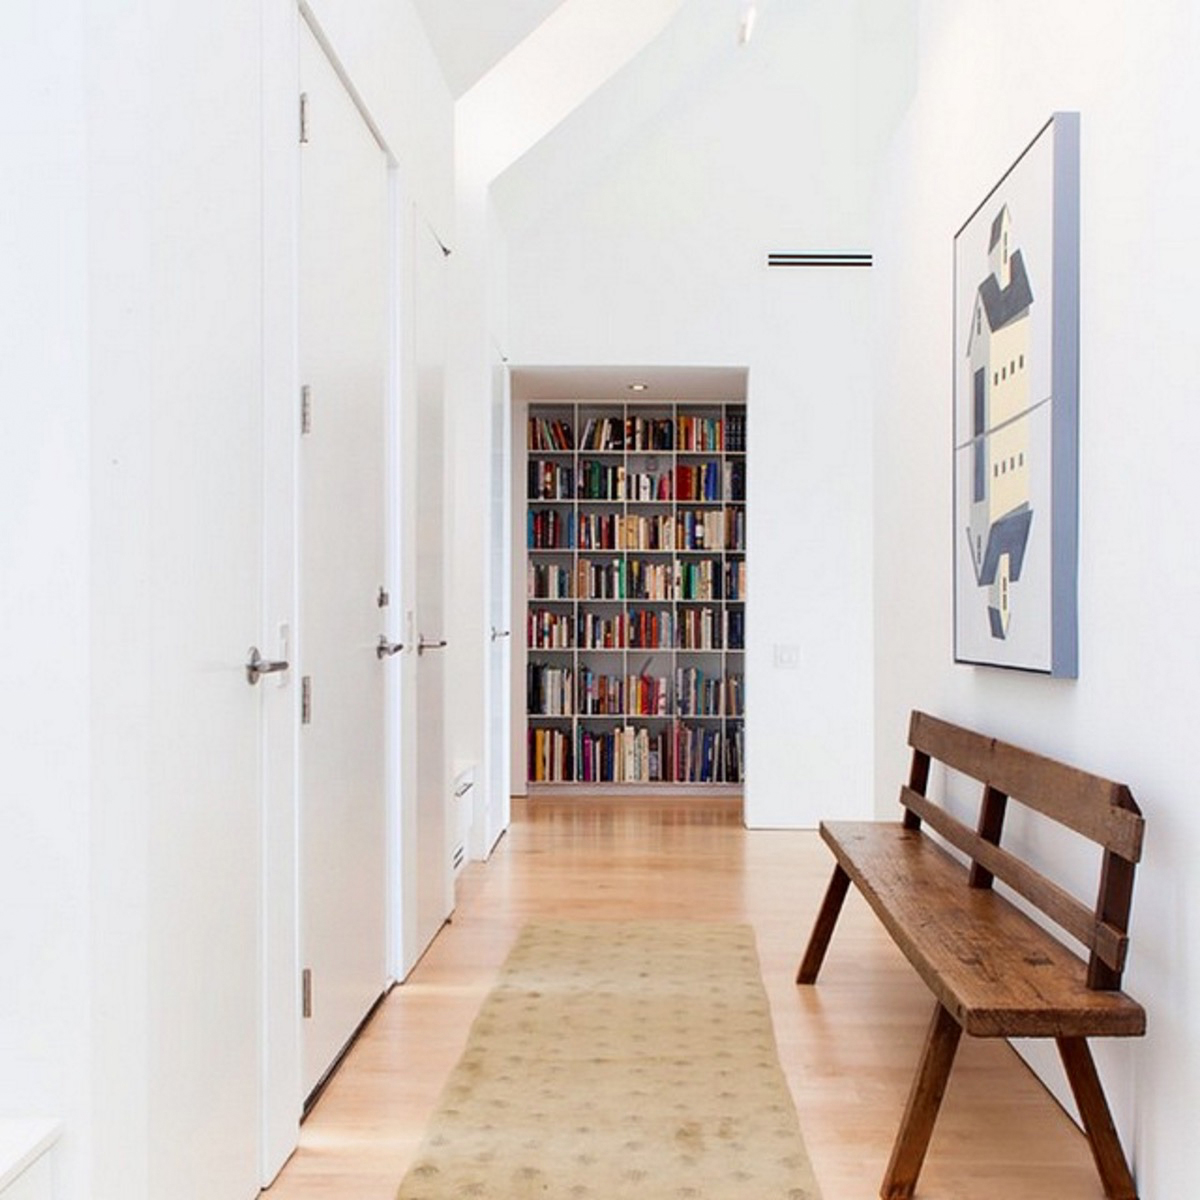 Interiordesign marvellous for Home design agency leeds